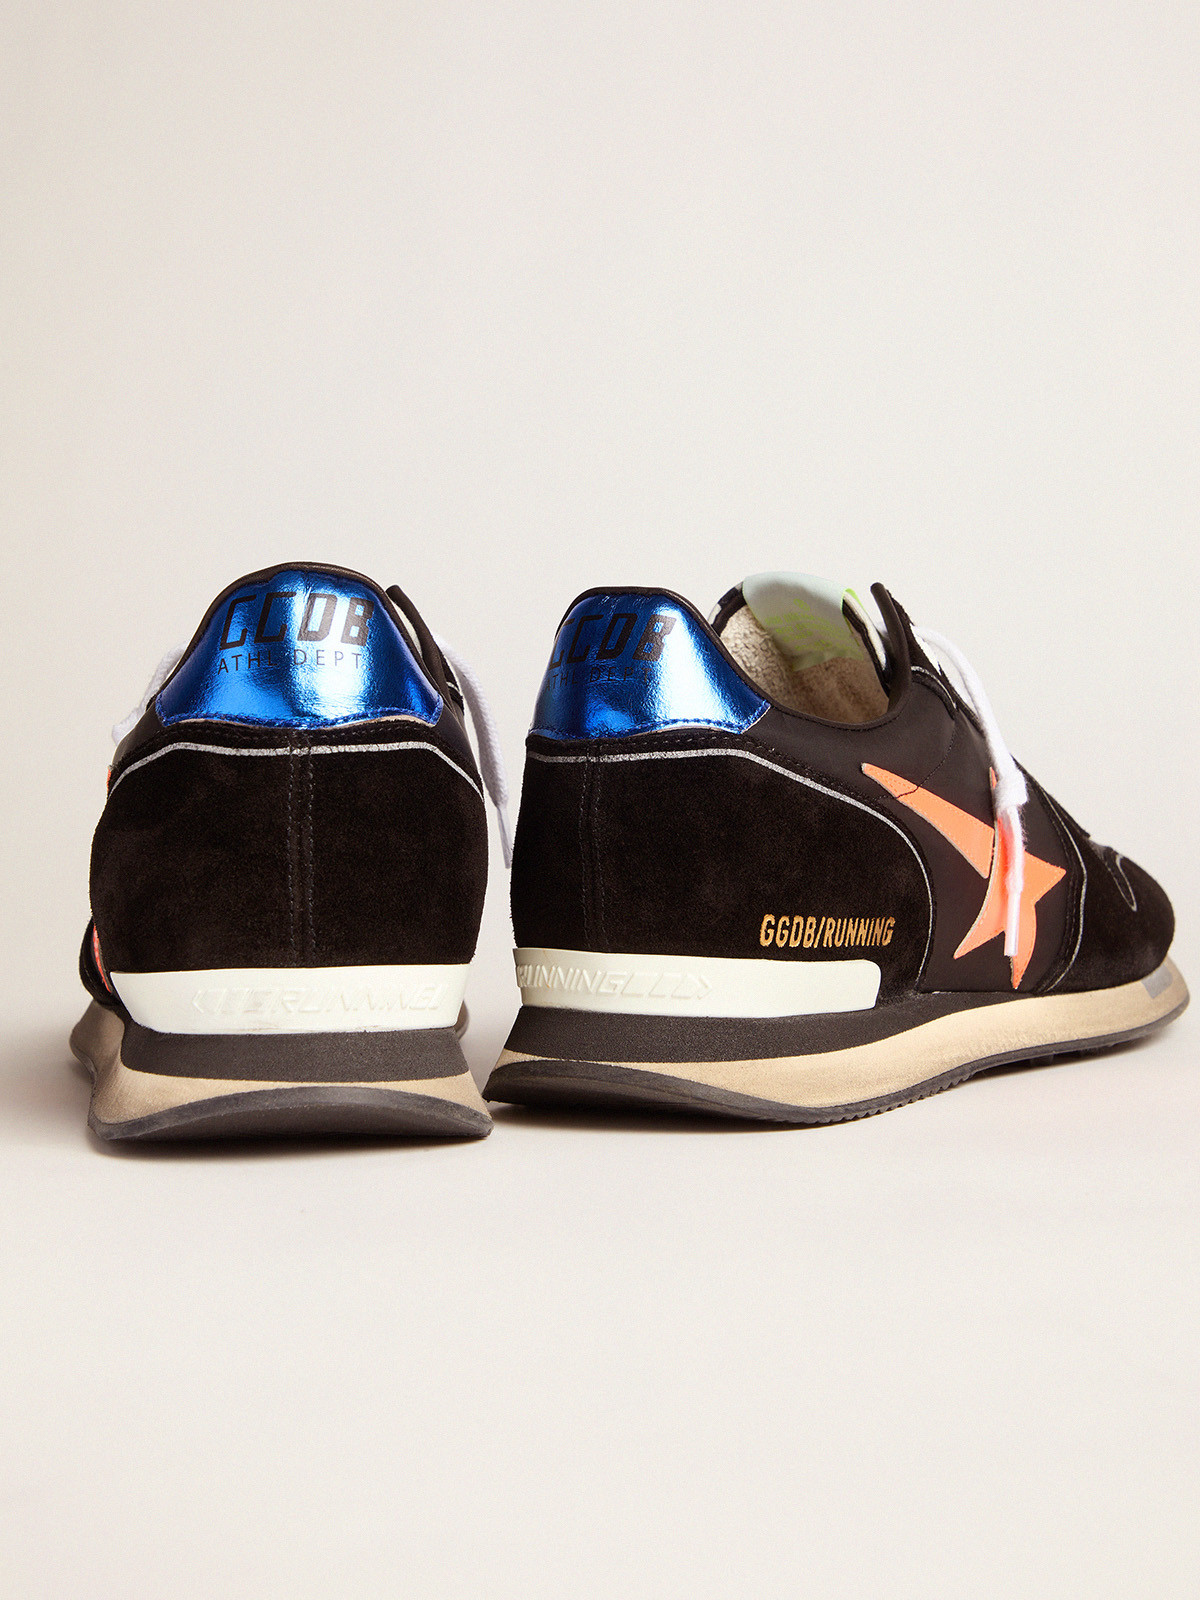 Golden Goose - Sneakers Running nere con stella arancio fluo in